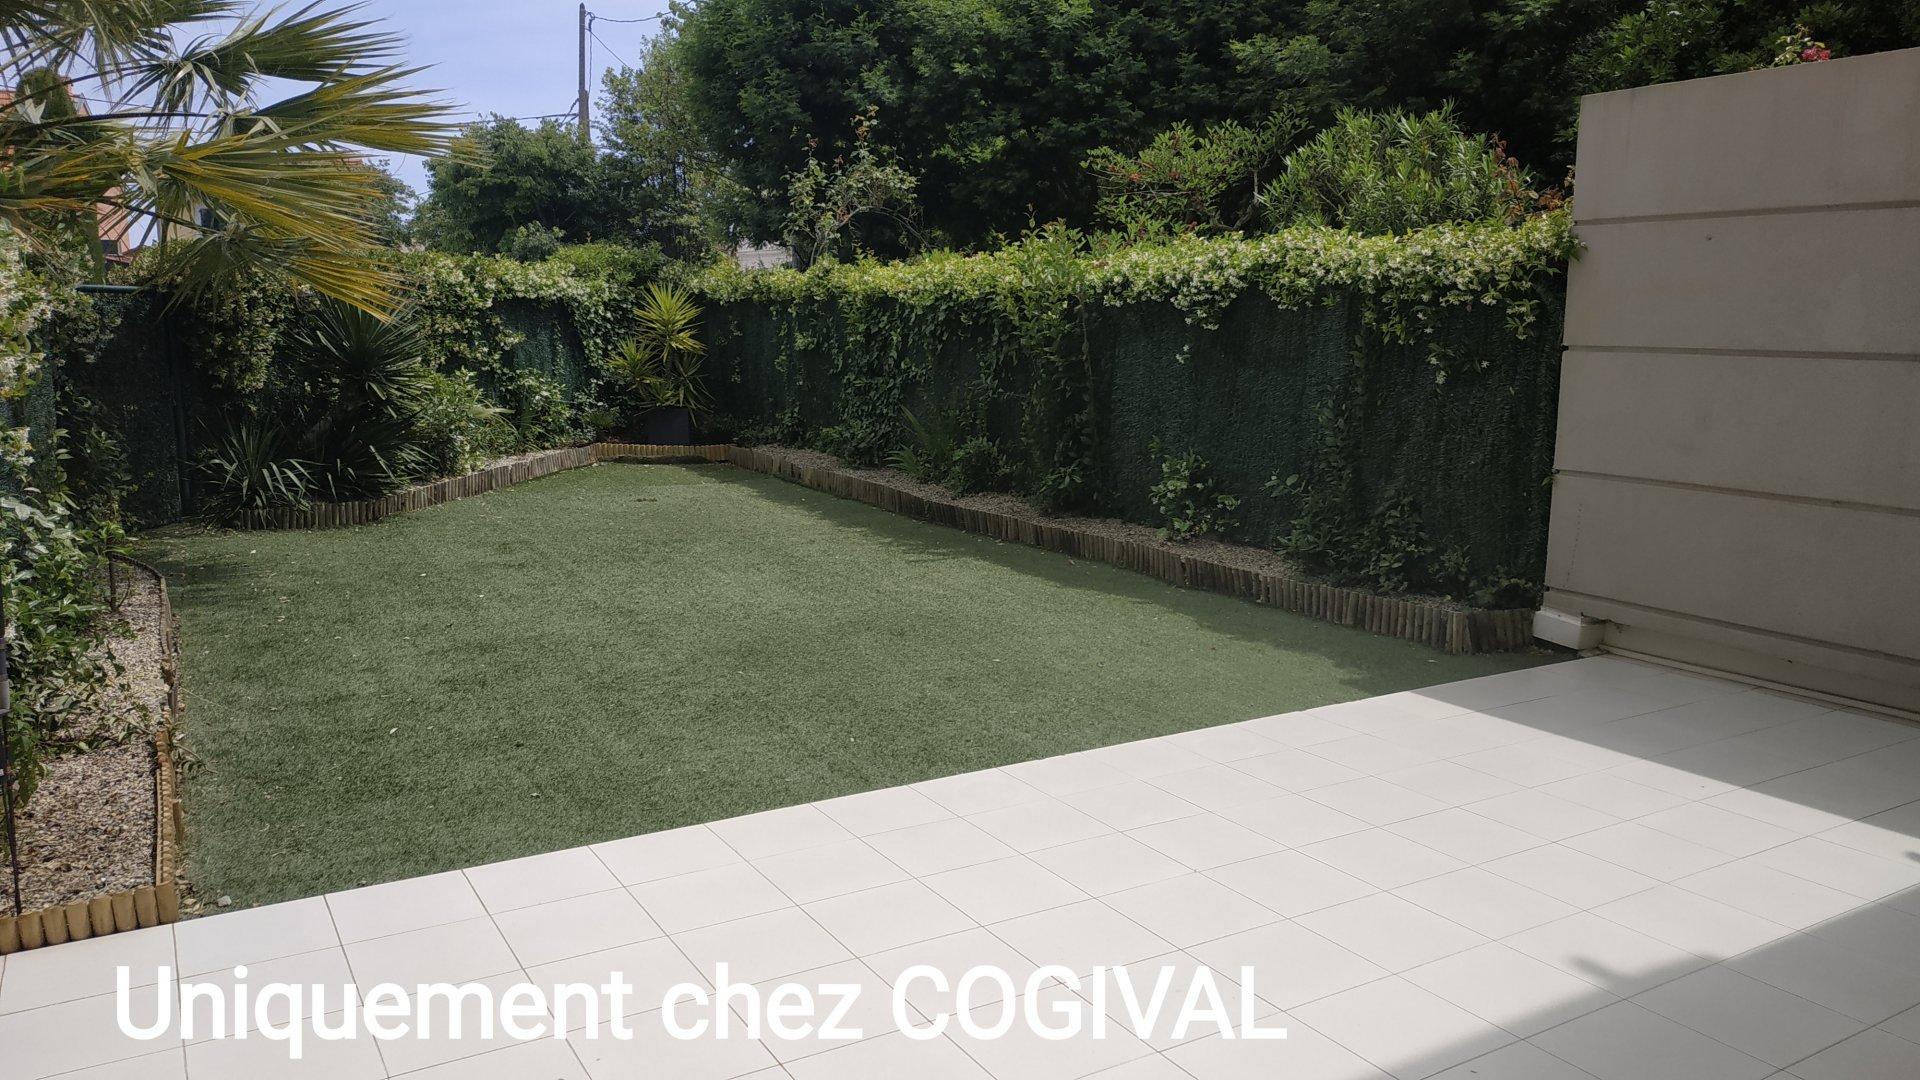 GOLFE JUAN - Rare Bel F2 en rez-de jardin dans résidence avec piscine - terrasse & garage